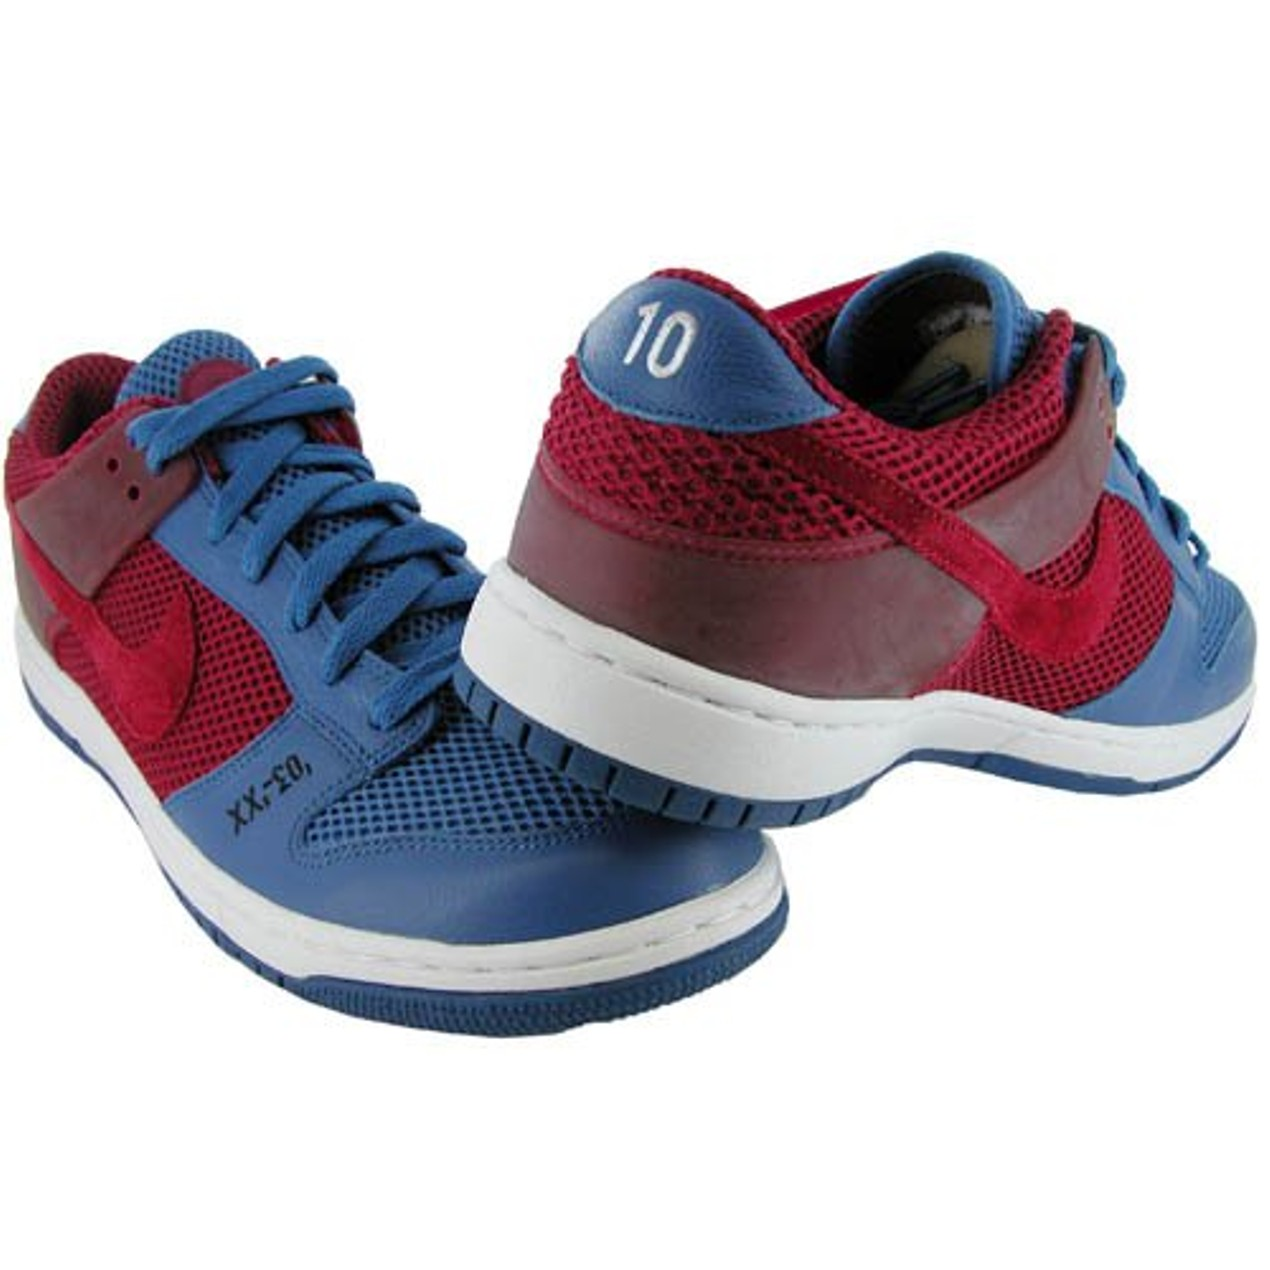 more photos c5a07 3d6f5 Nike Air Zoom Dunkesto Ronaldinho Brazil Shoes ...